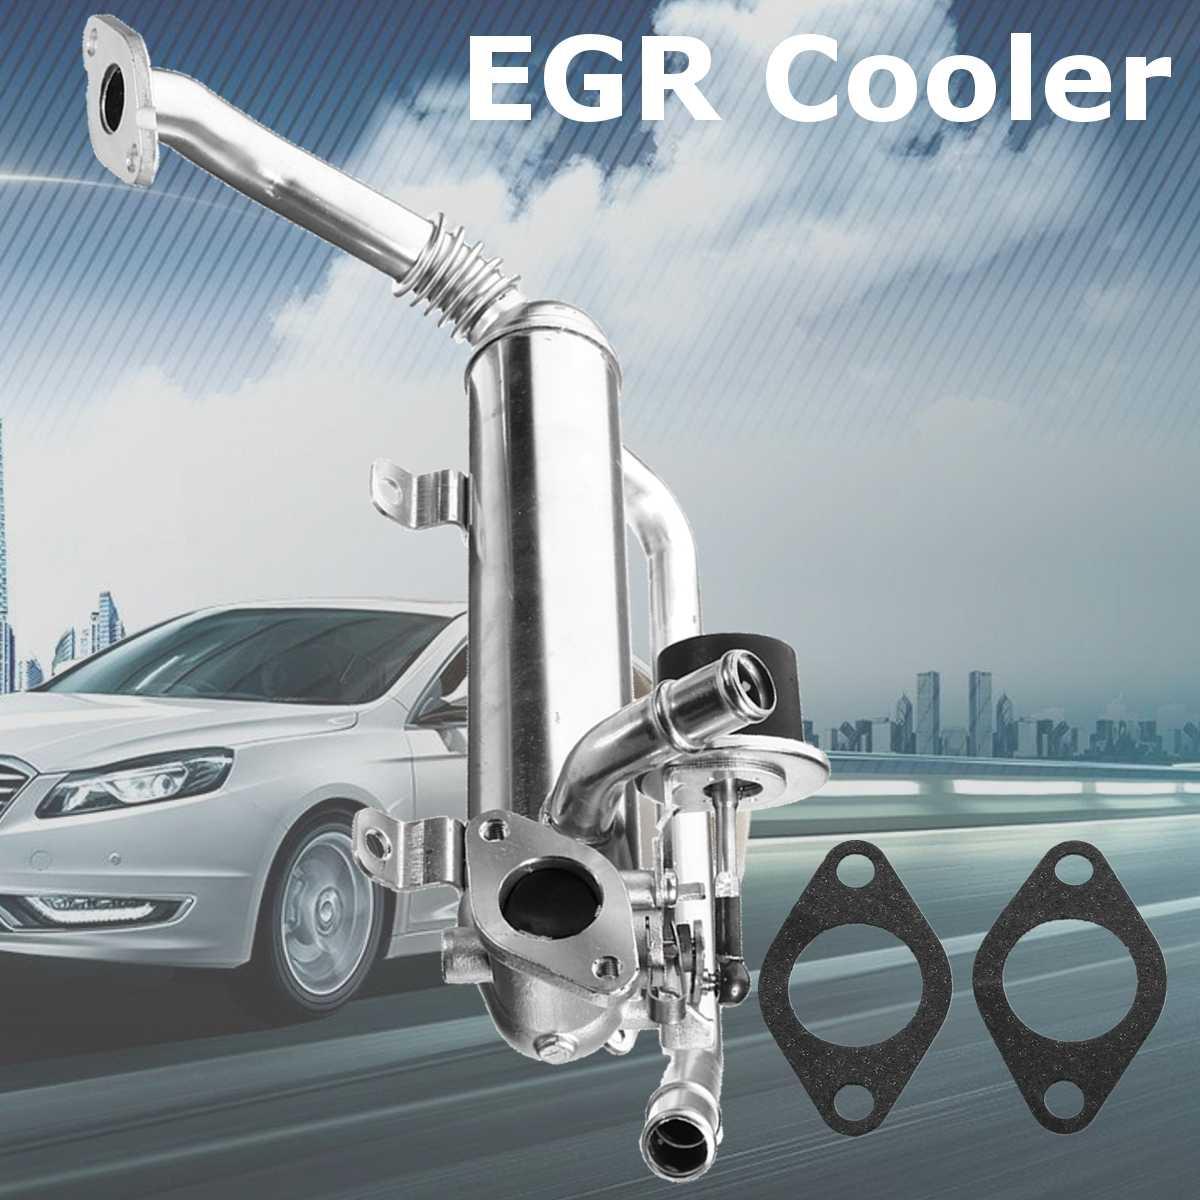 EGR Cooler Exhaust Gas Recirculation Valve For Volkswagen Audi-Seat 03G131512AD Aluminium Alloy Silver Auto Replacement Parts